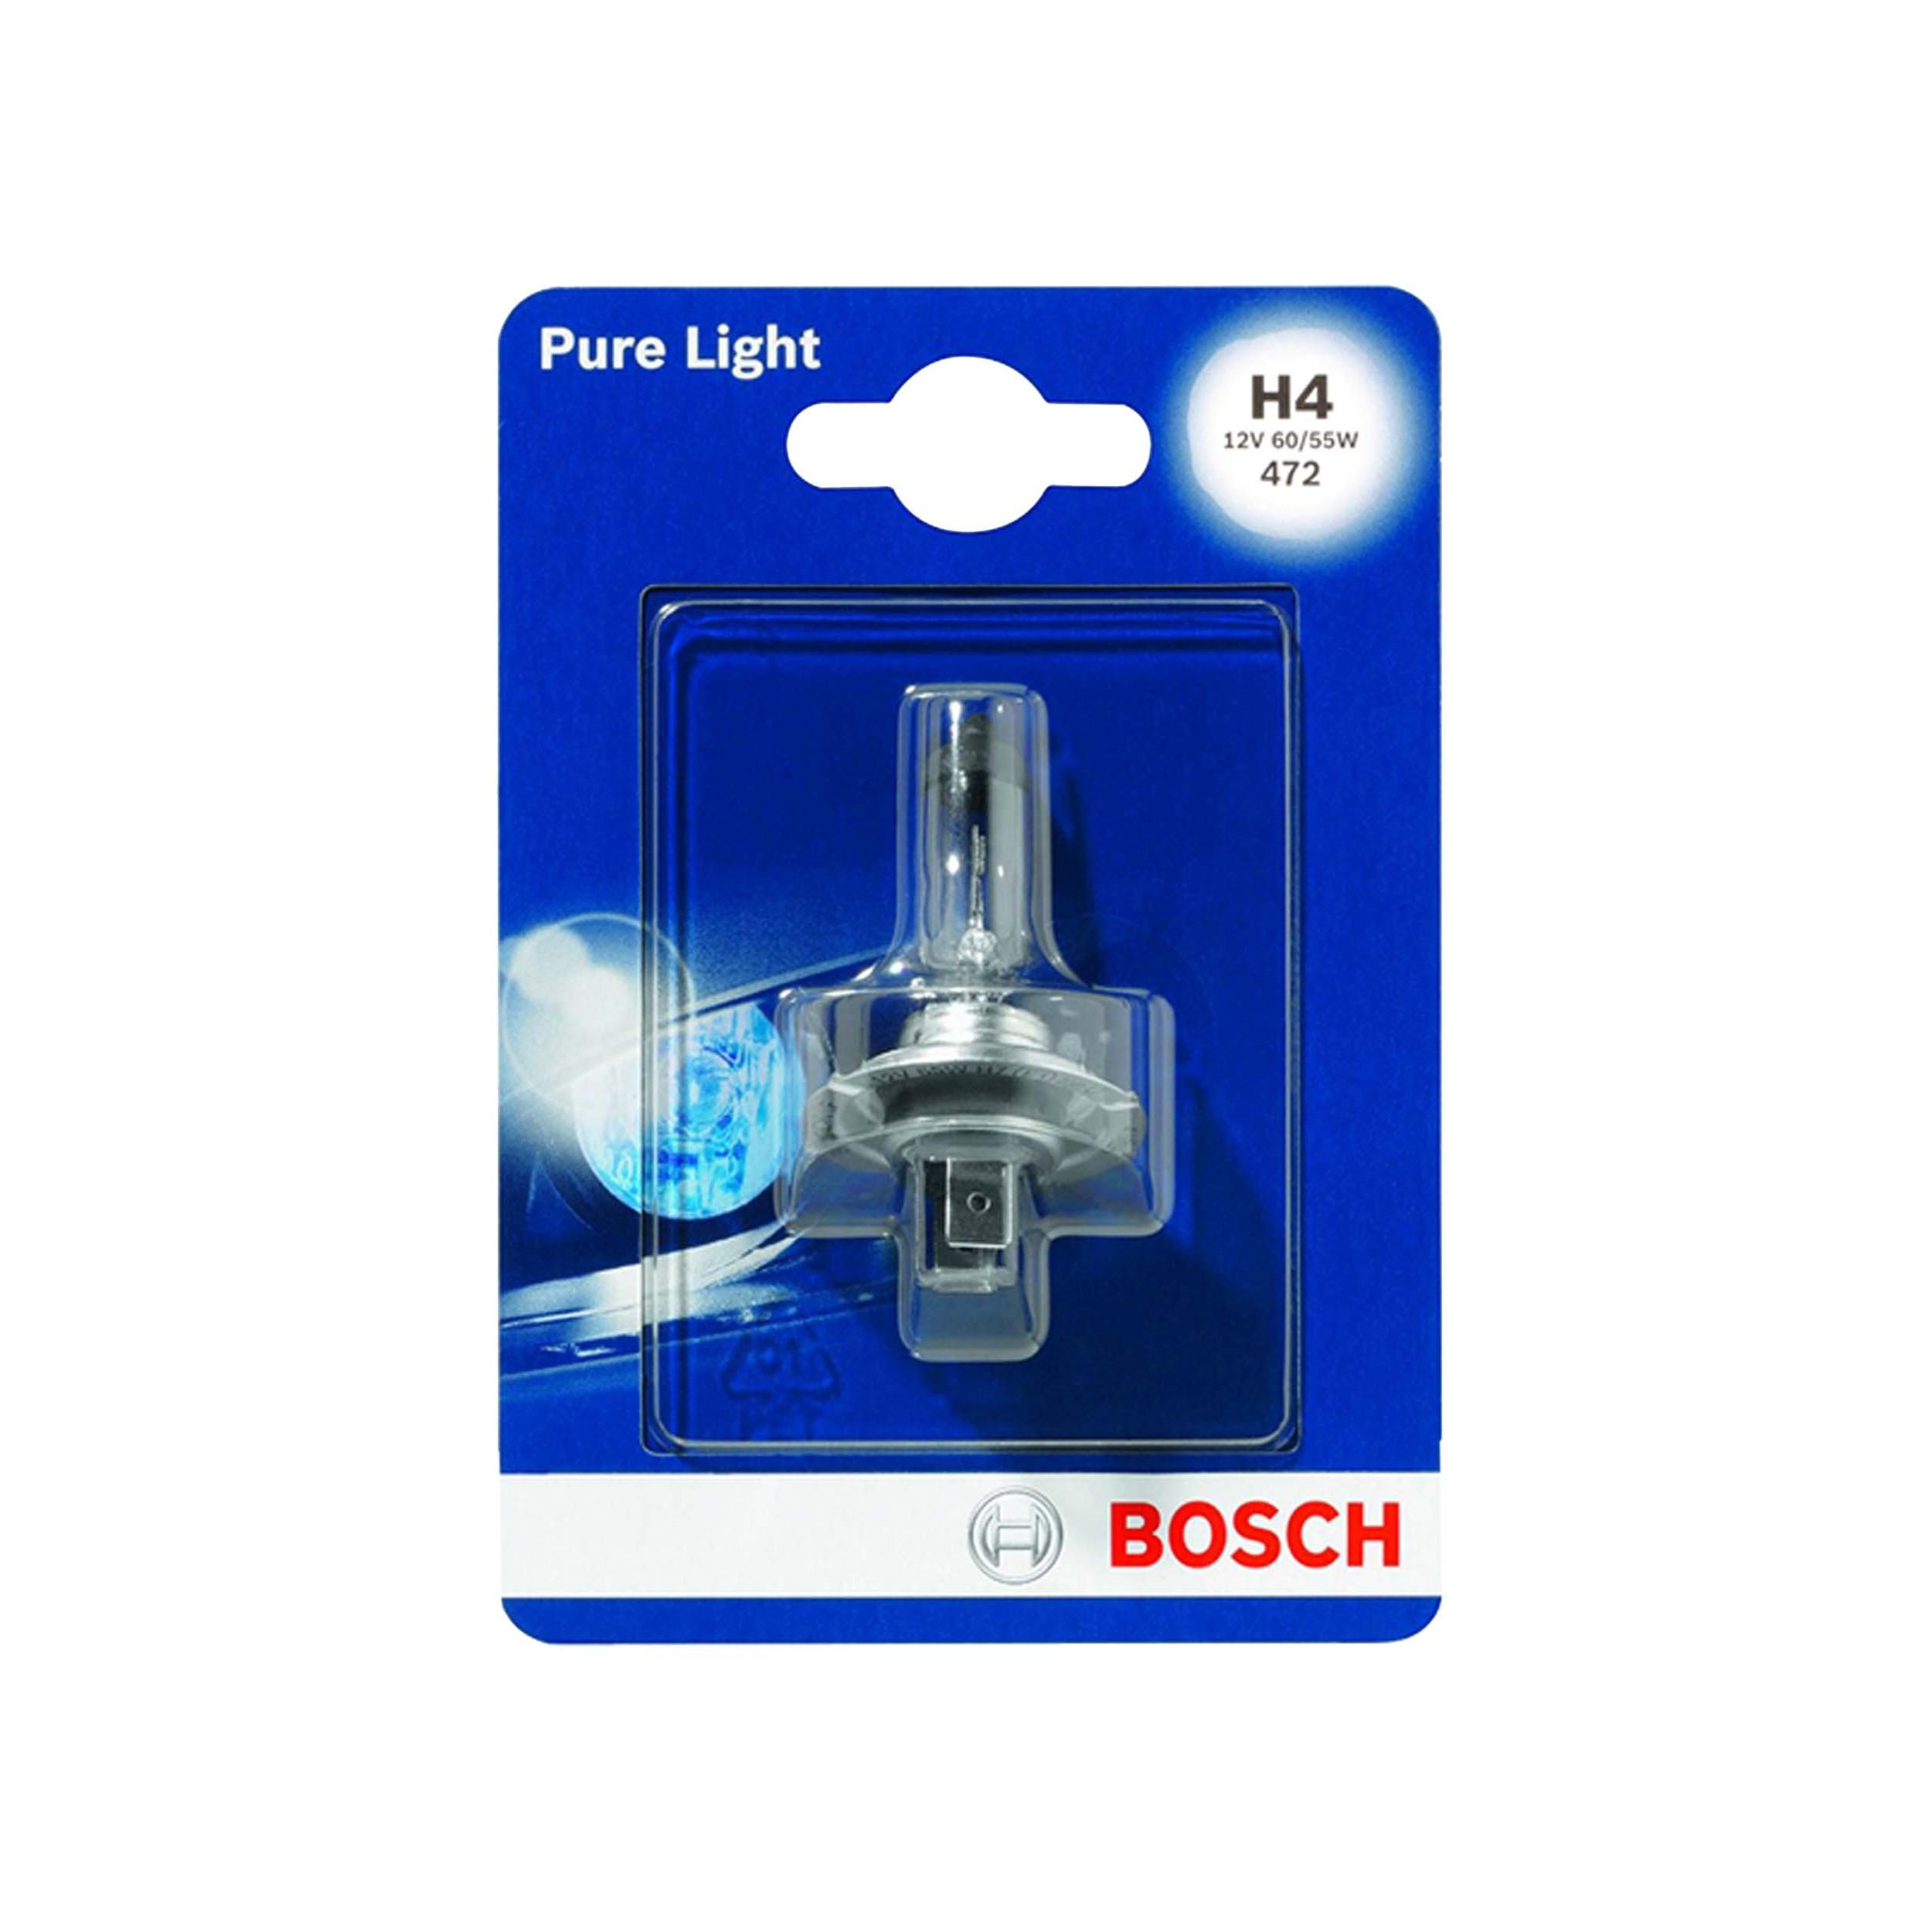 BOSCH 1 LAMP H4            001